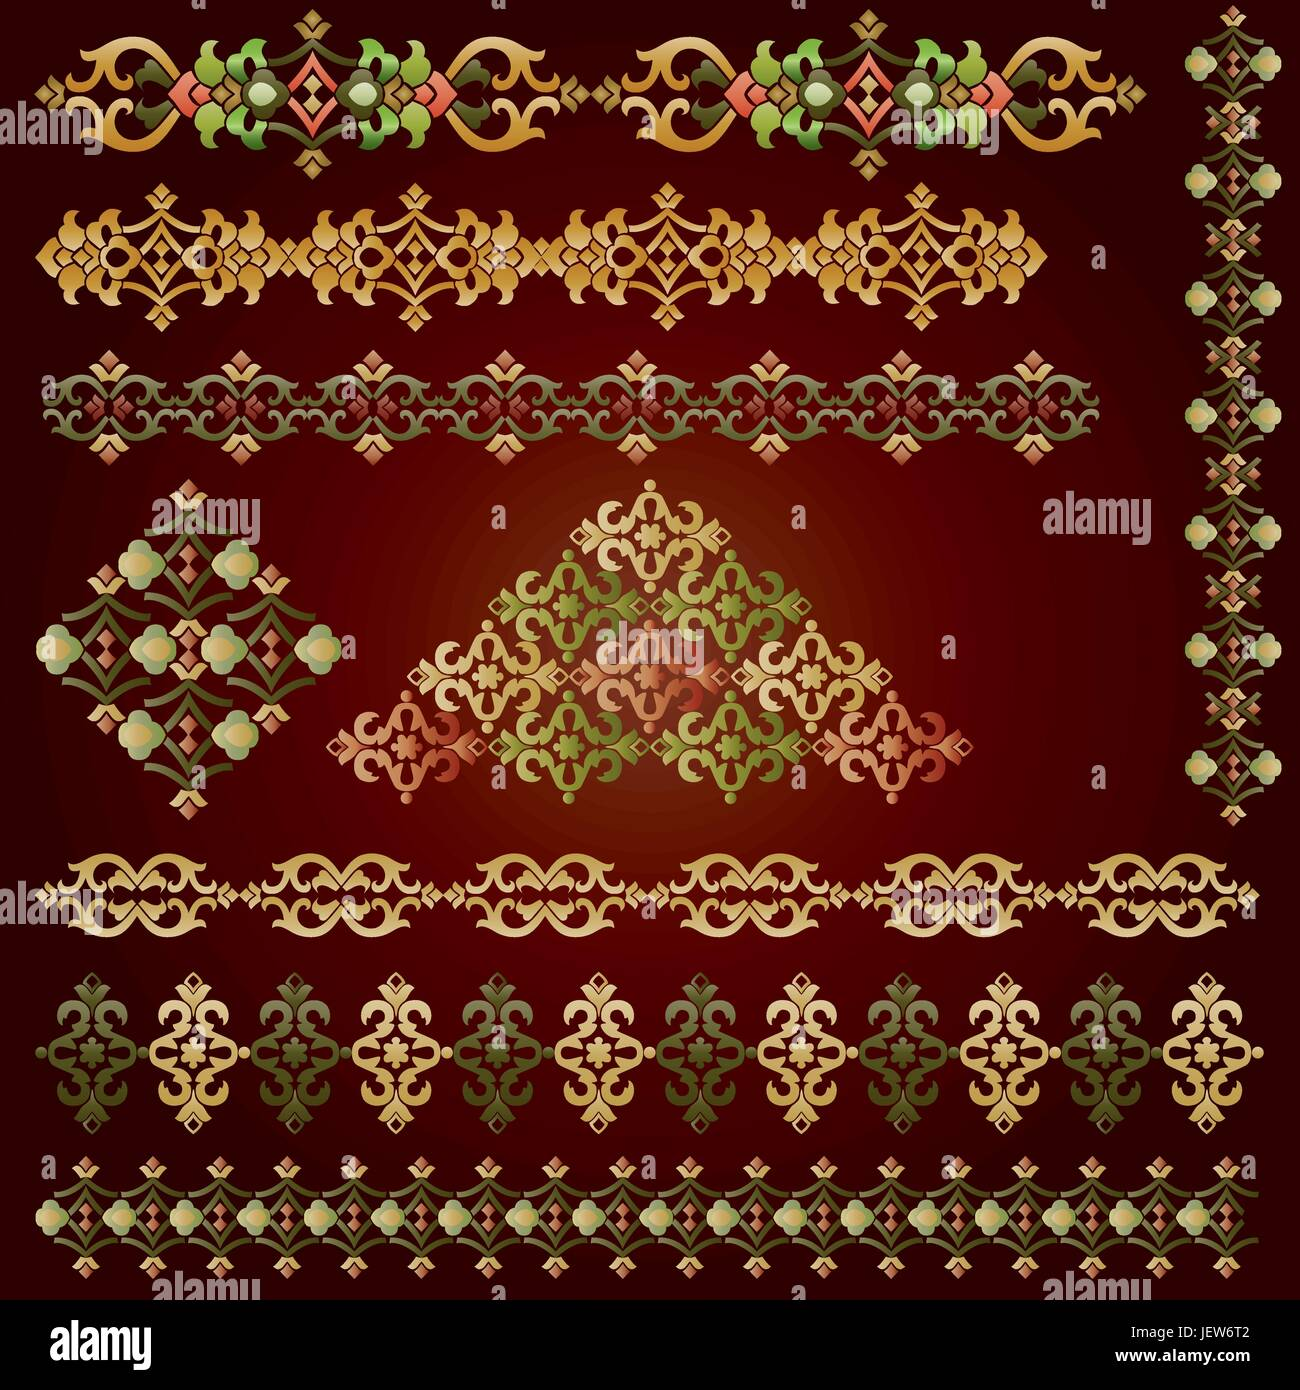 Antik, Vintage, islamische, Muster, Satz, Rahmen, Grenze, Rahmen ...